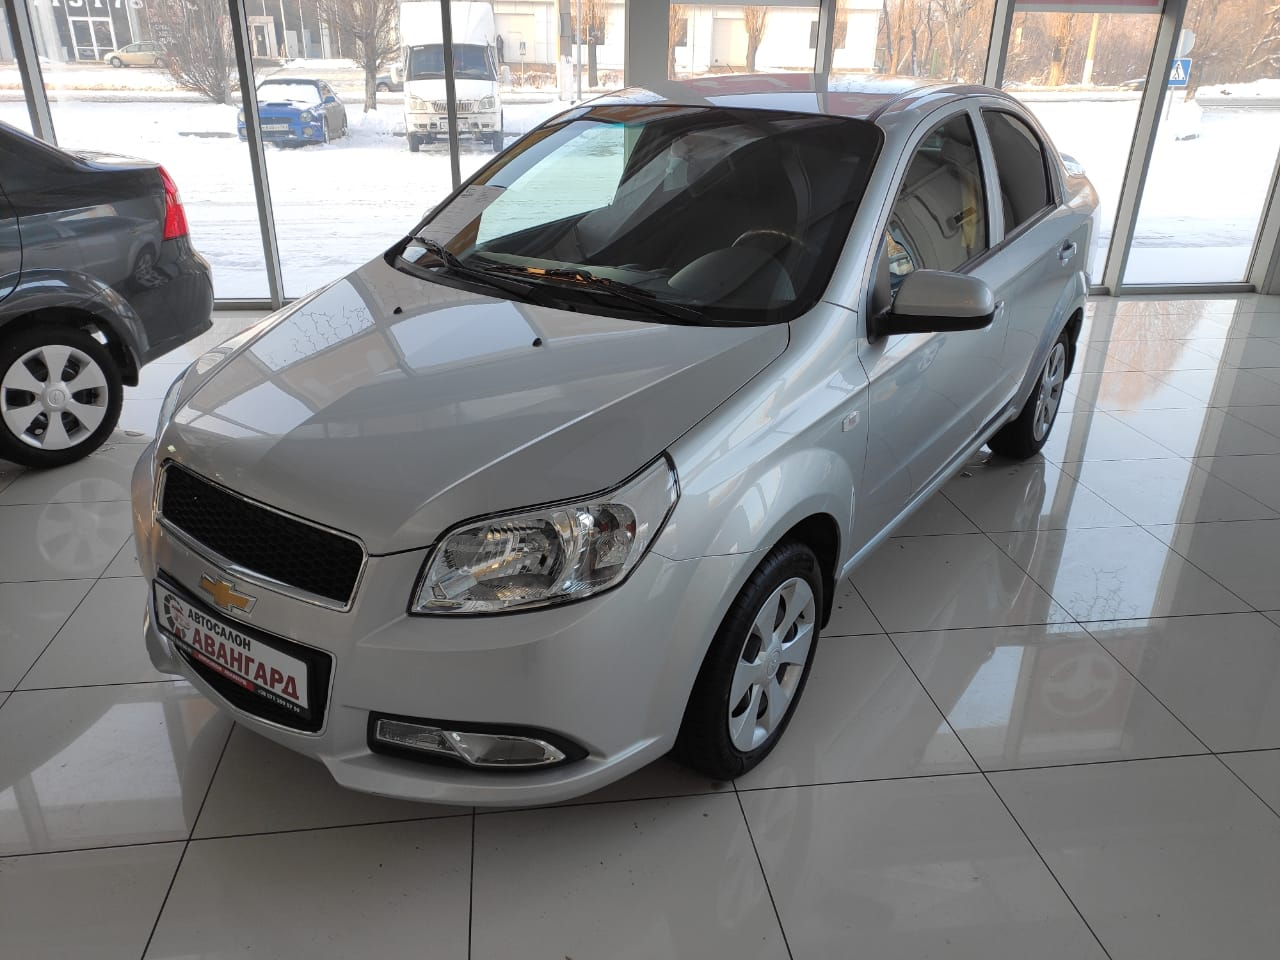 Chevrolet Nexia 1.5 16 кл. (105 л.с.) 5МТ комплектации LT, цвет серебристый